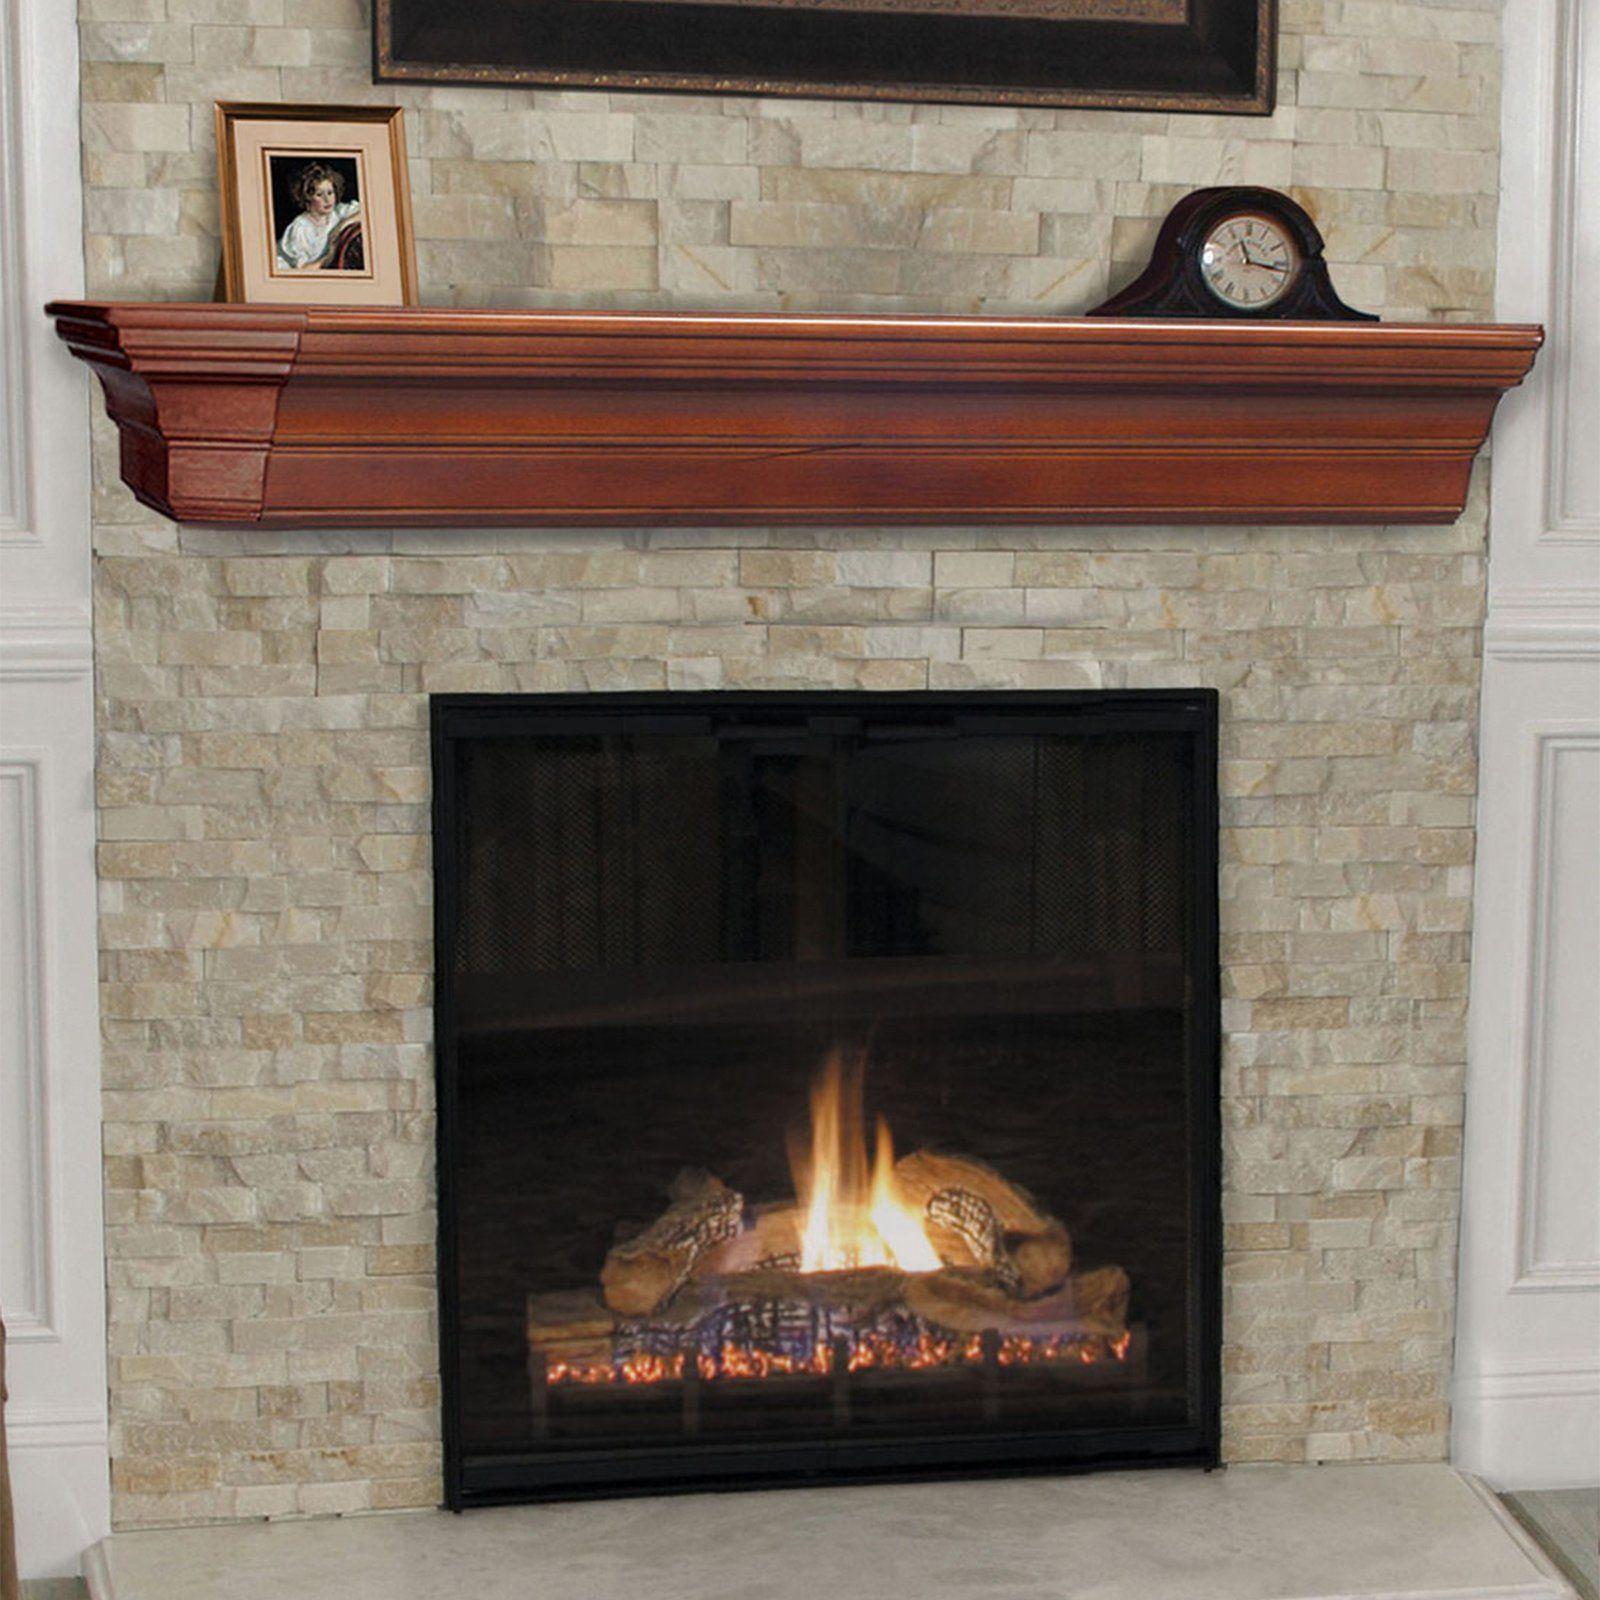 Pearl Mantels Lindon Traditional Fireplace Mantel Shelf The Pearl Mantels Lindon Traditional Fireplace Mantel Shelf Embodies Classic Mi Fireplace Shelves Mantel